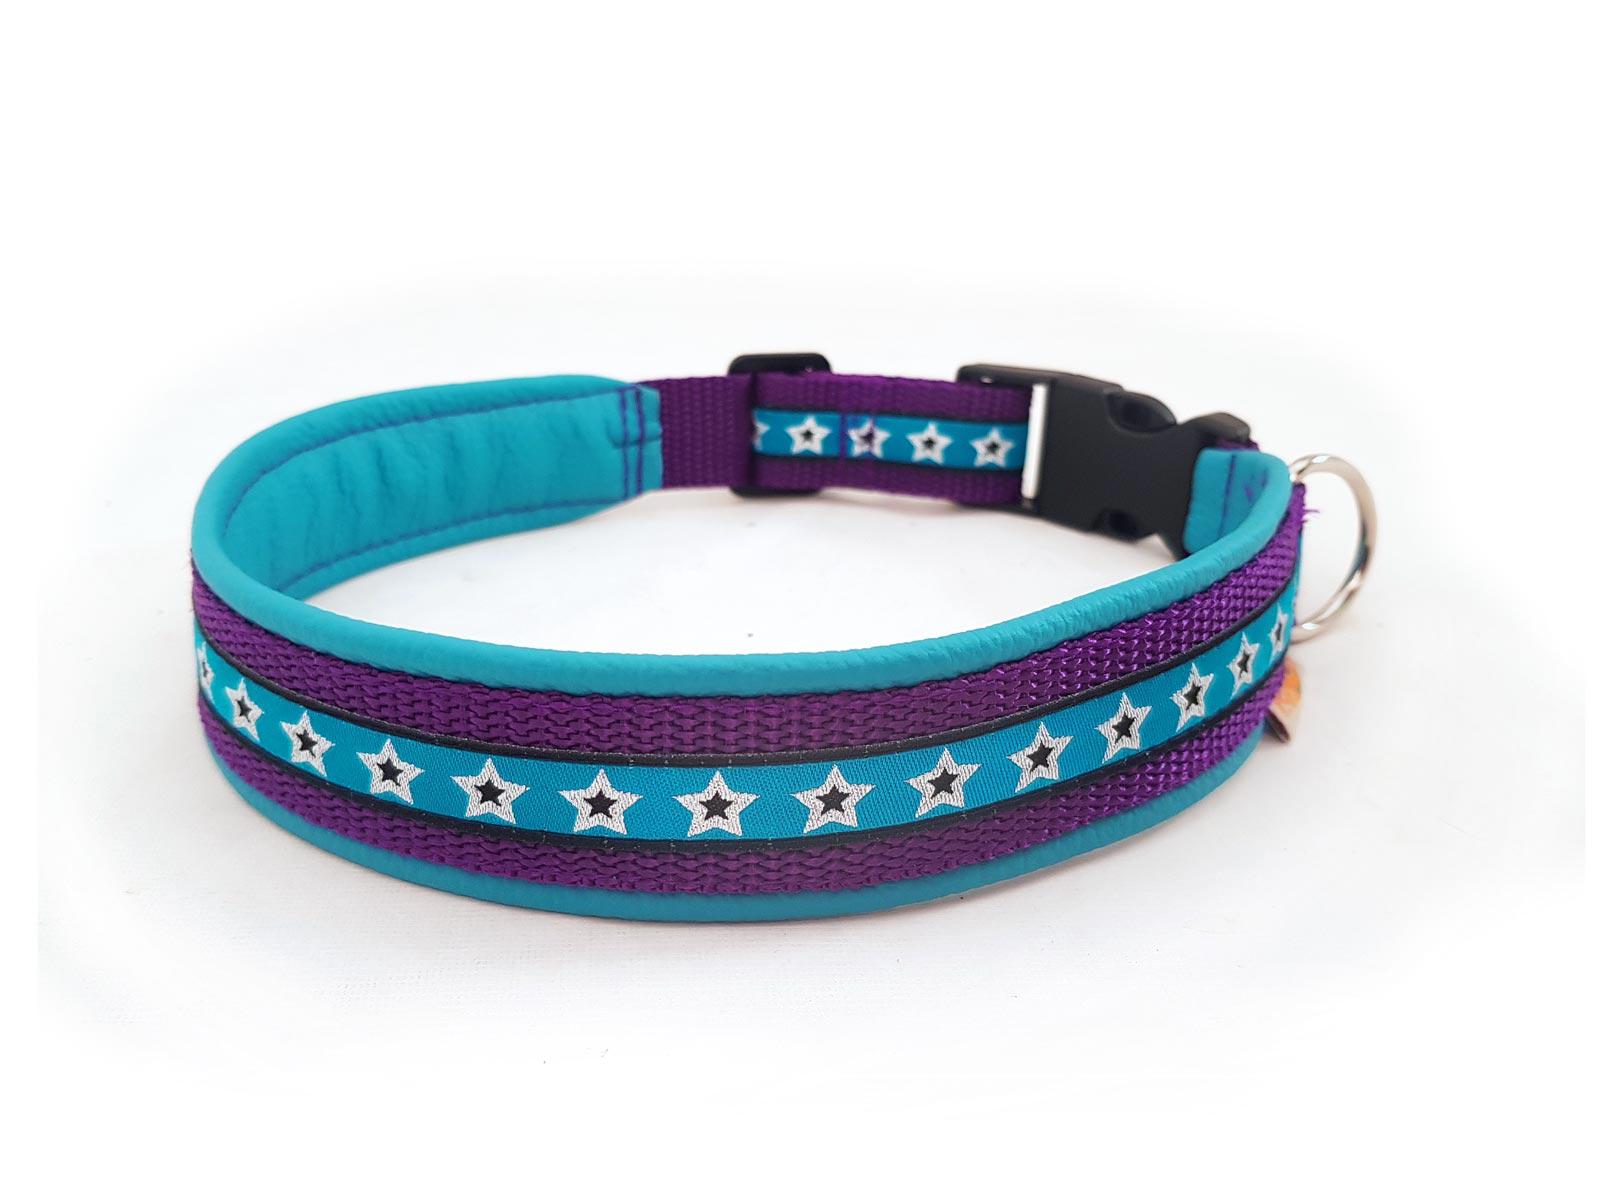 Hundehalsband Starline lila türkis